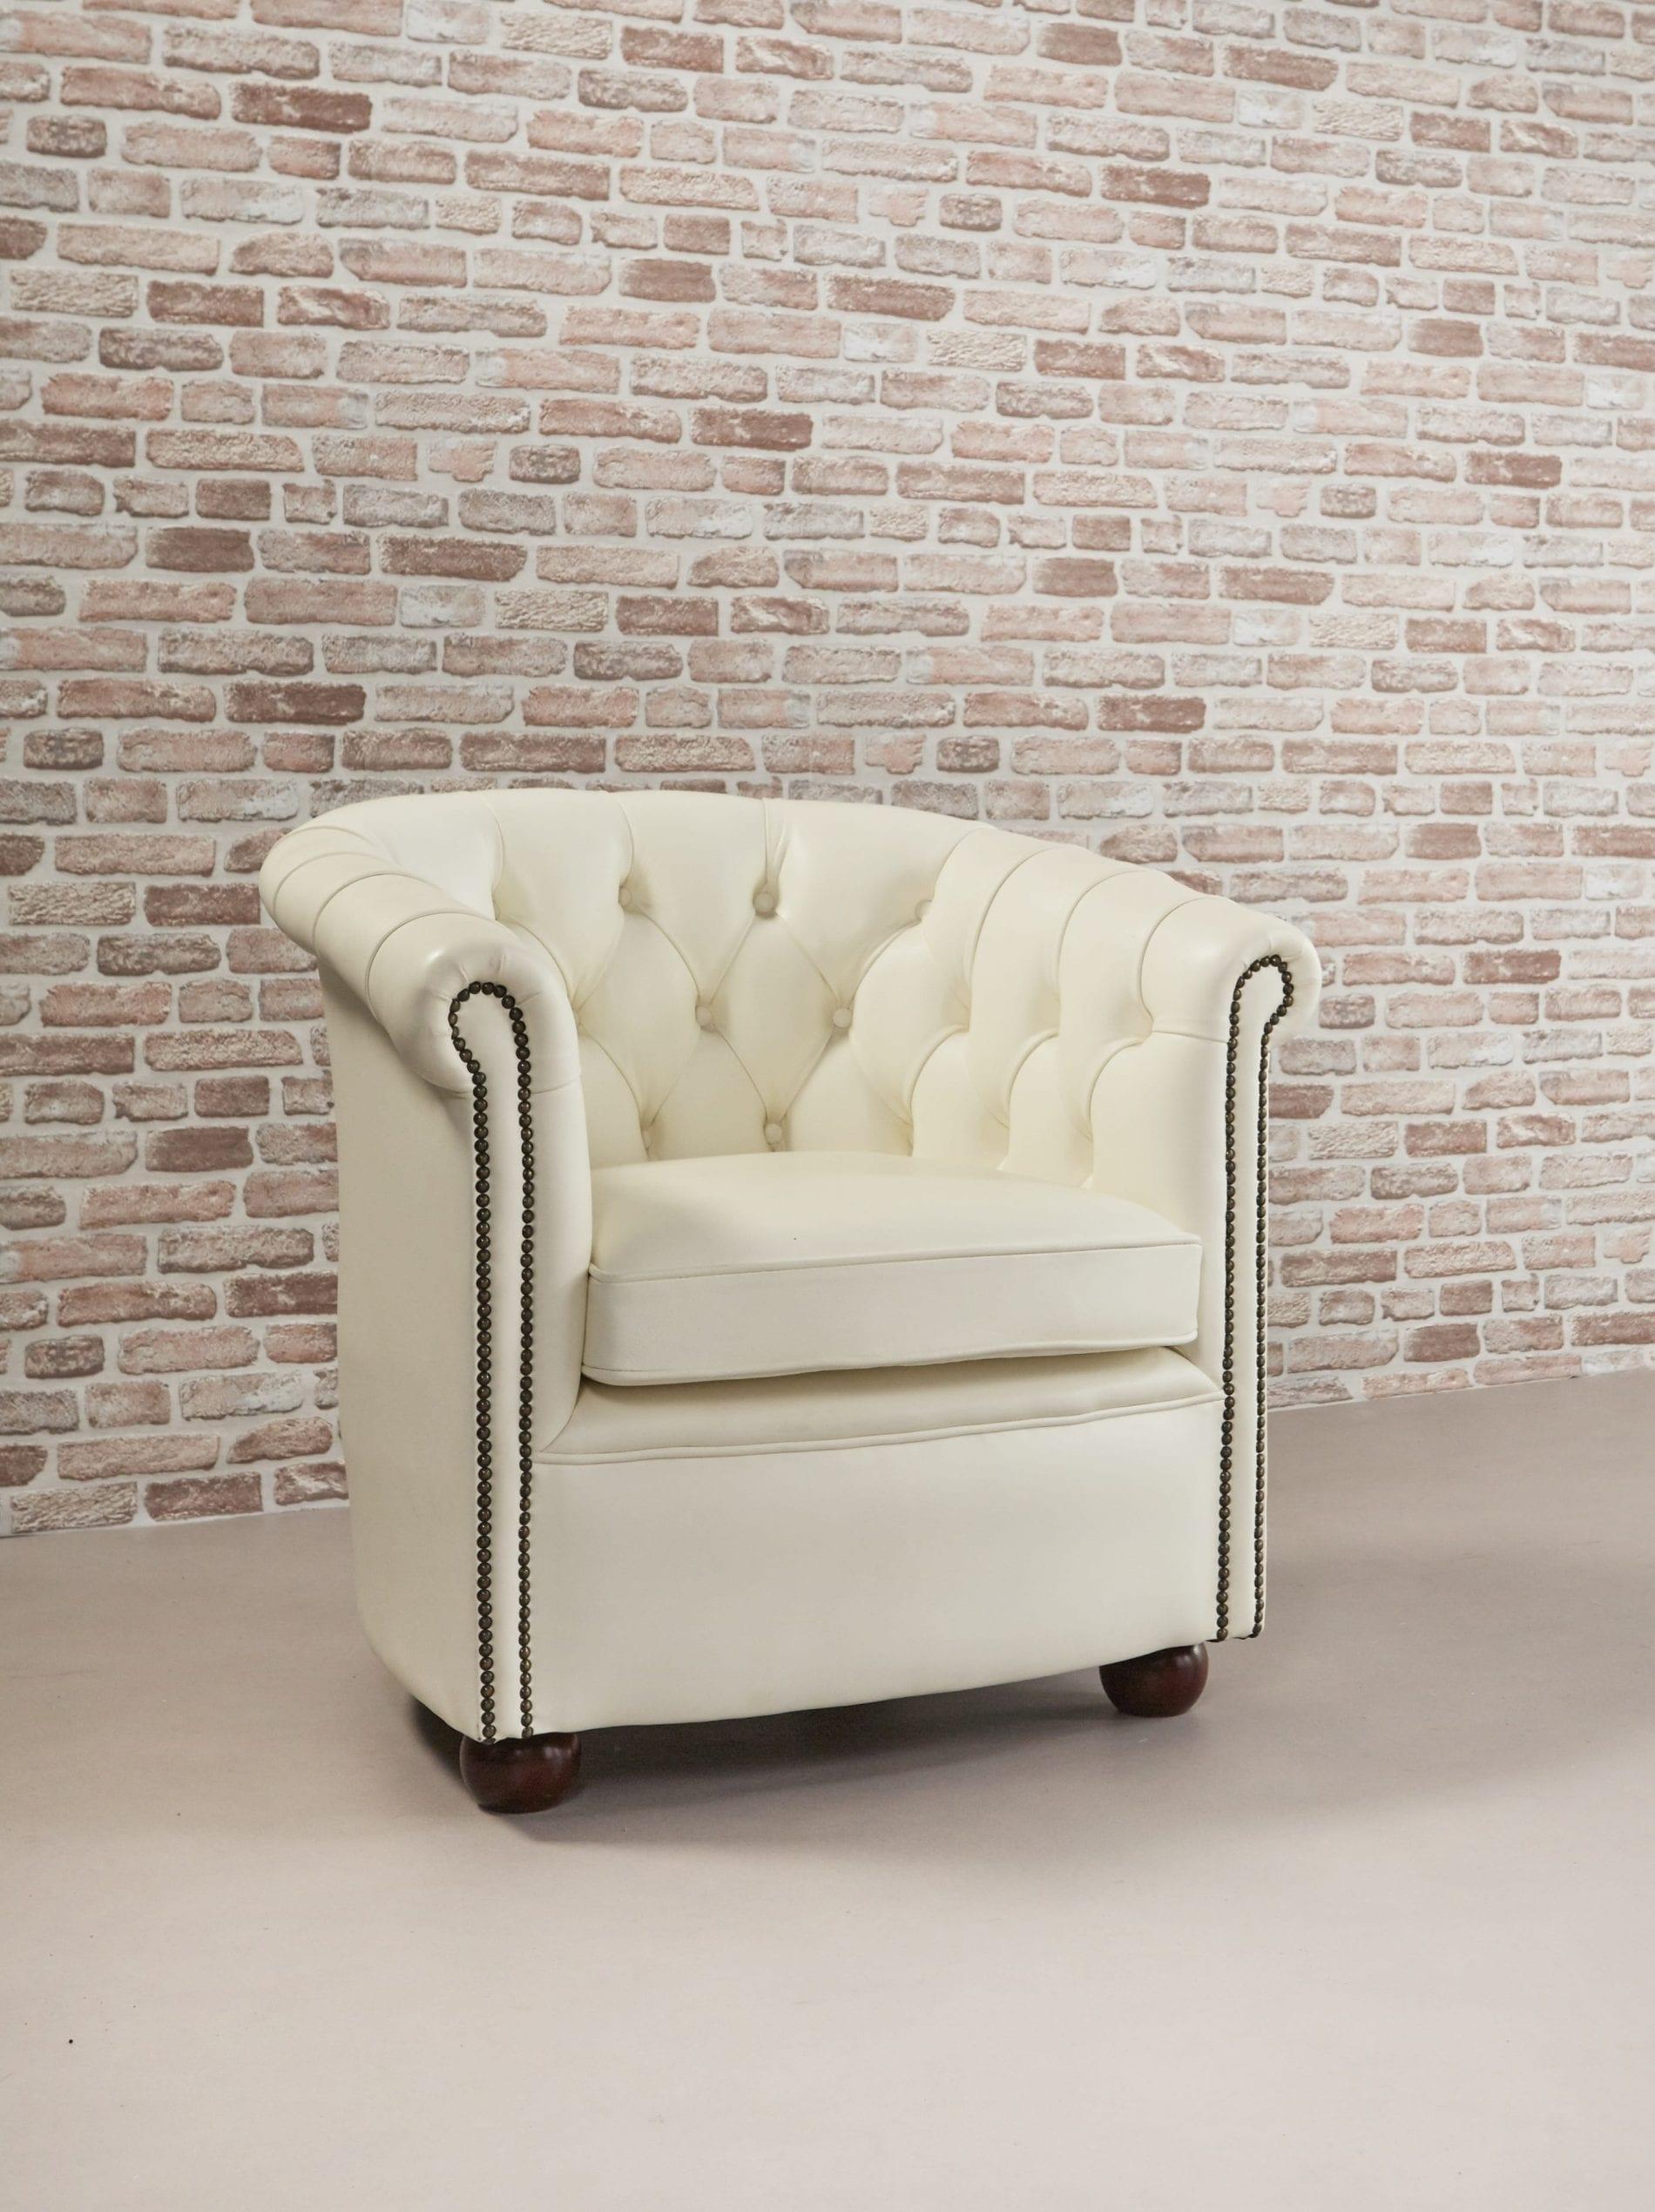 Delta-chesterfield-traditioneel-tub-chair-byran-magnolia-white-zijaanzicht-rechts